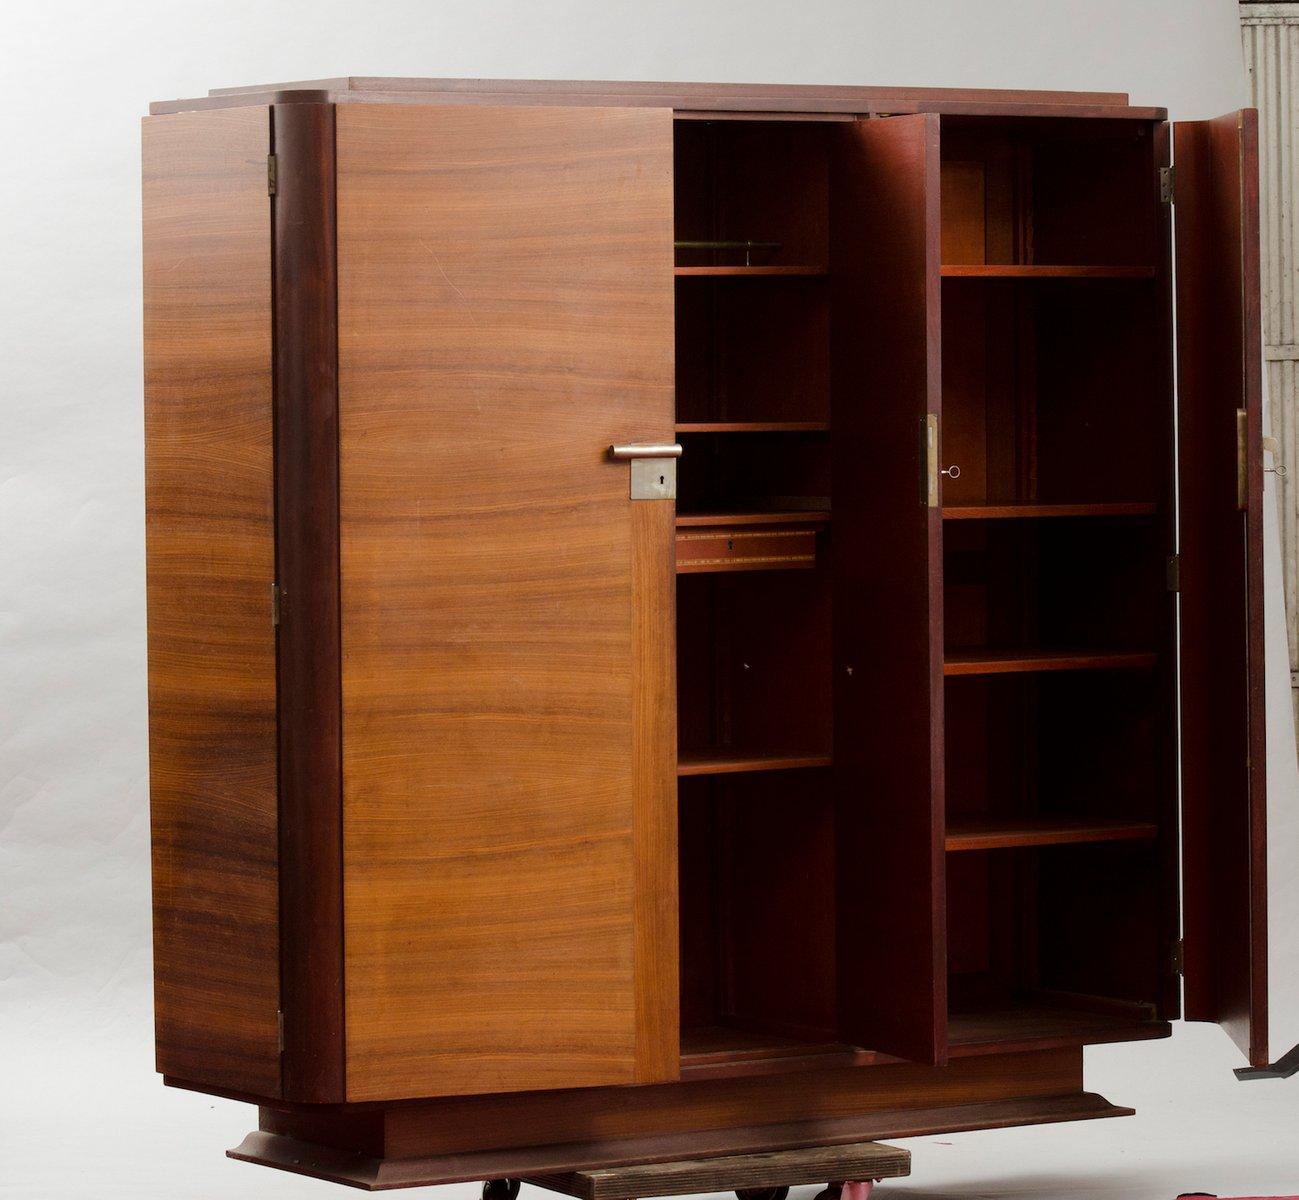 Kitchen Cabinet Veneer: Vintage Art Deco Rosewood Veneer Cabinet For Sale At Pamono